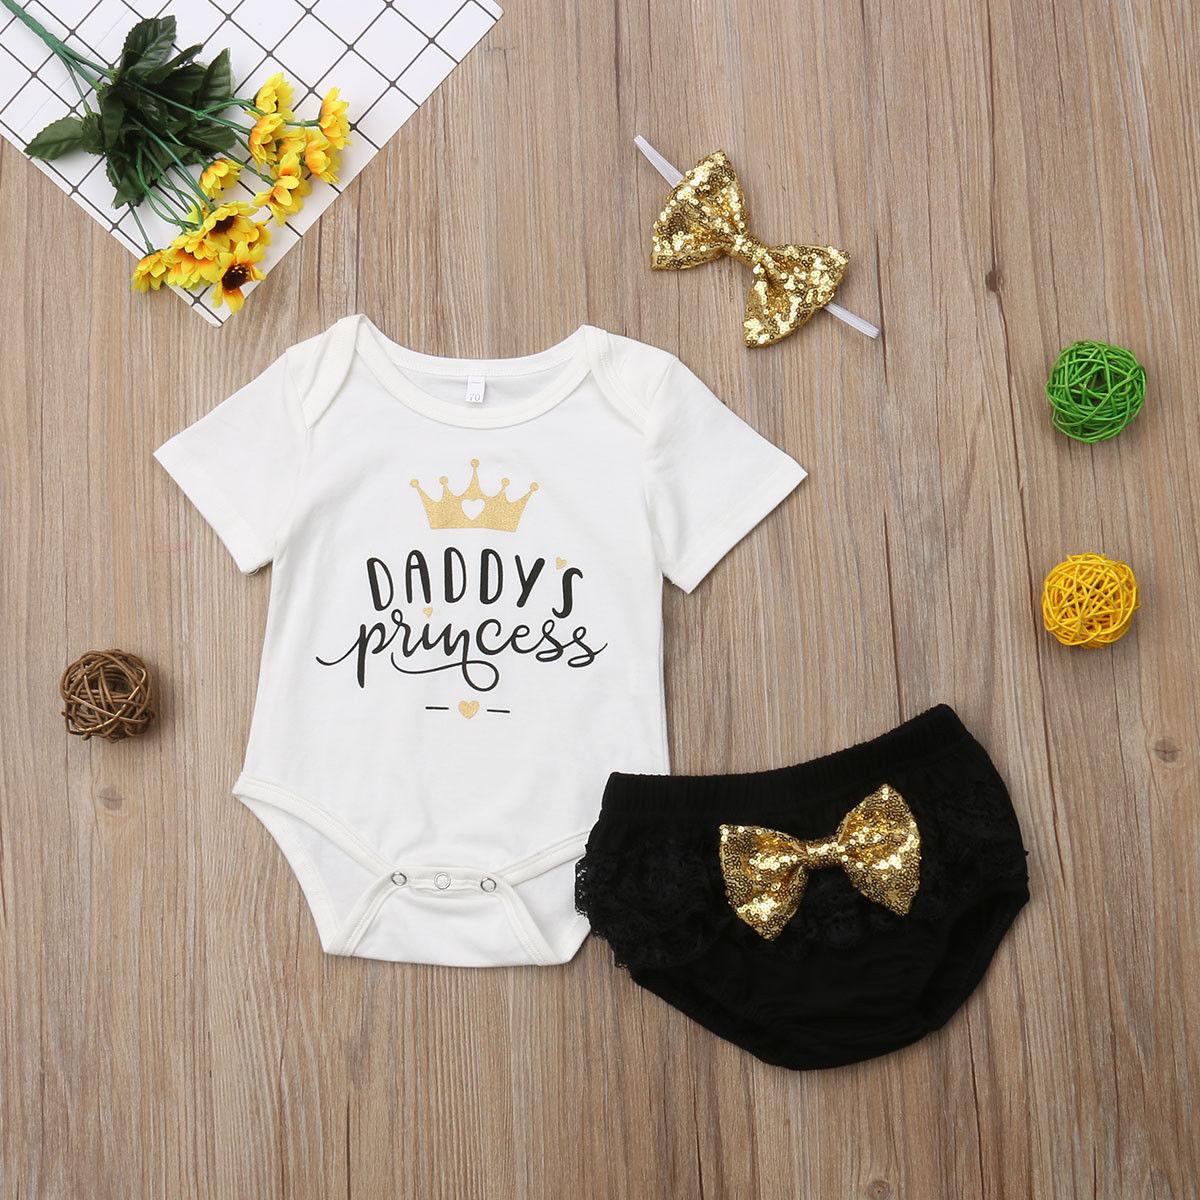 3Pcs Baby Girl Daddys Princess Short Sleeve Romper Tops Sequins Bow Lace Shorts Headband Set